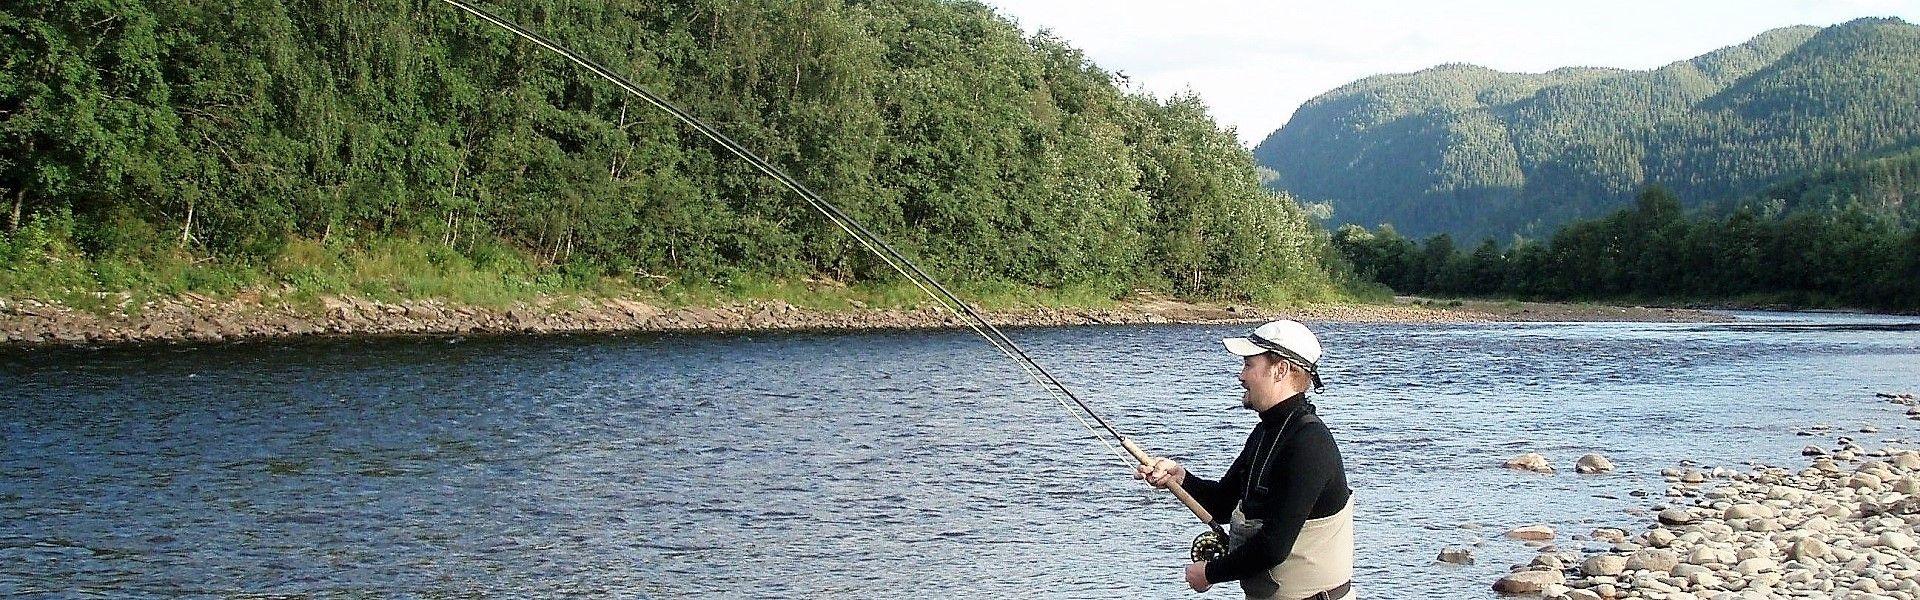 gaula gaulaflyfishing gaulaflyfishinglodge rivergaula gaulariver gaulajoki norway norja norge salmon laks lax lohi perhokalastus flyfishing flugfiske fluefiske salmonflyfishing perhokalastusmatka lohenkalastus kalastus kalastusmatka fishmaster globalfishing